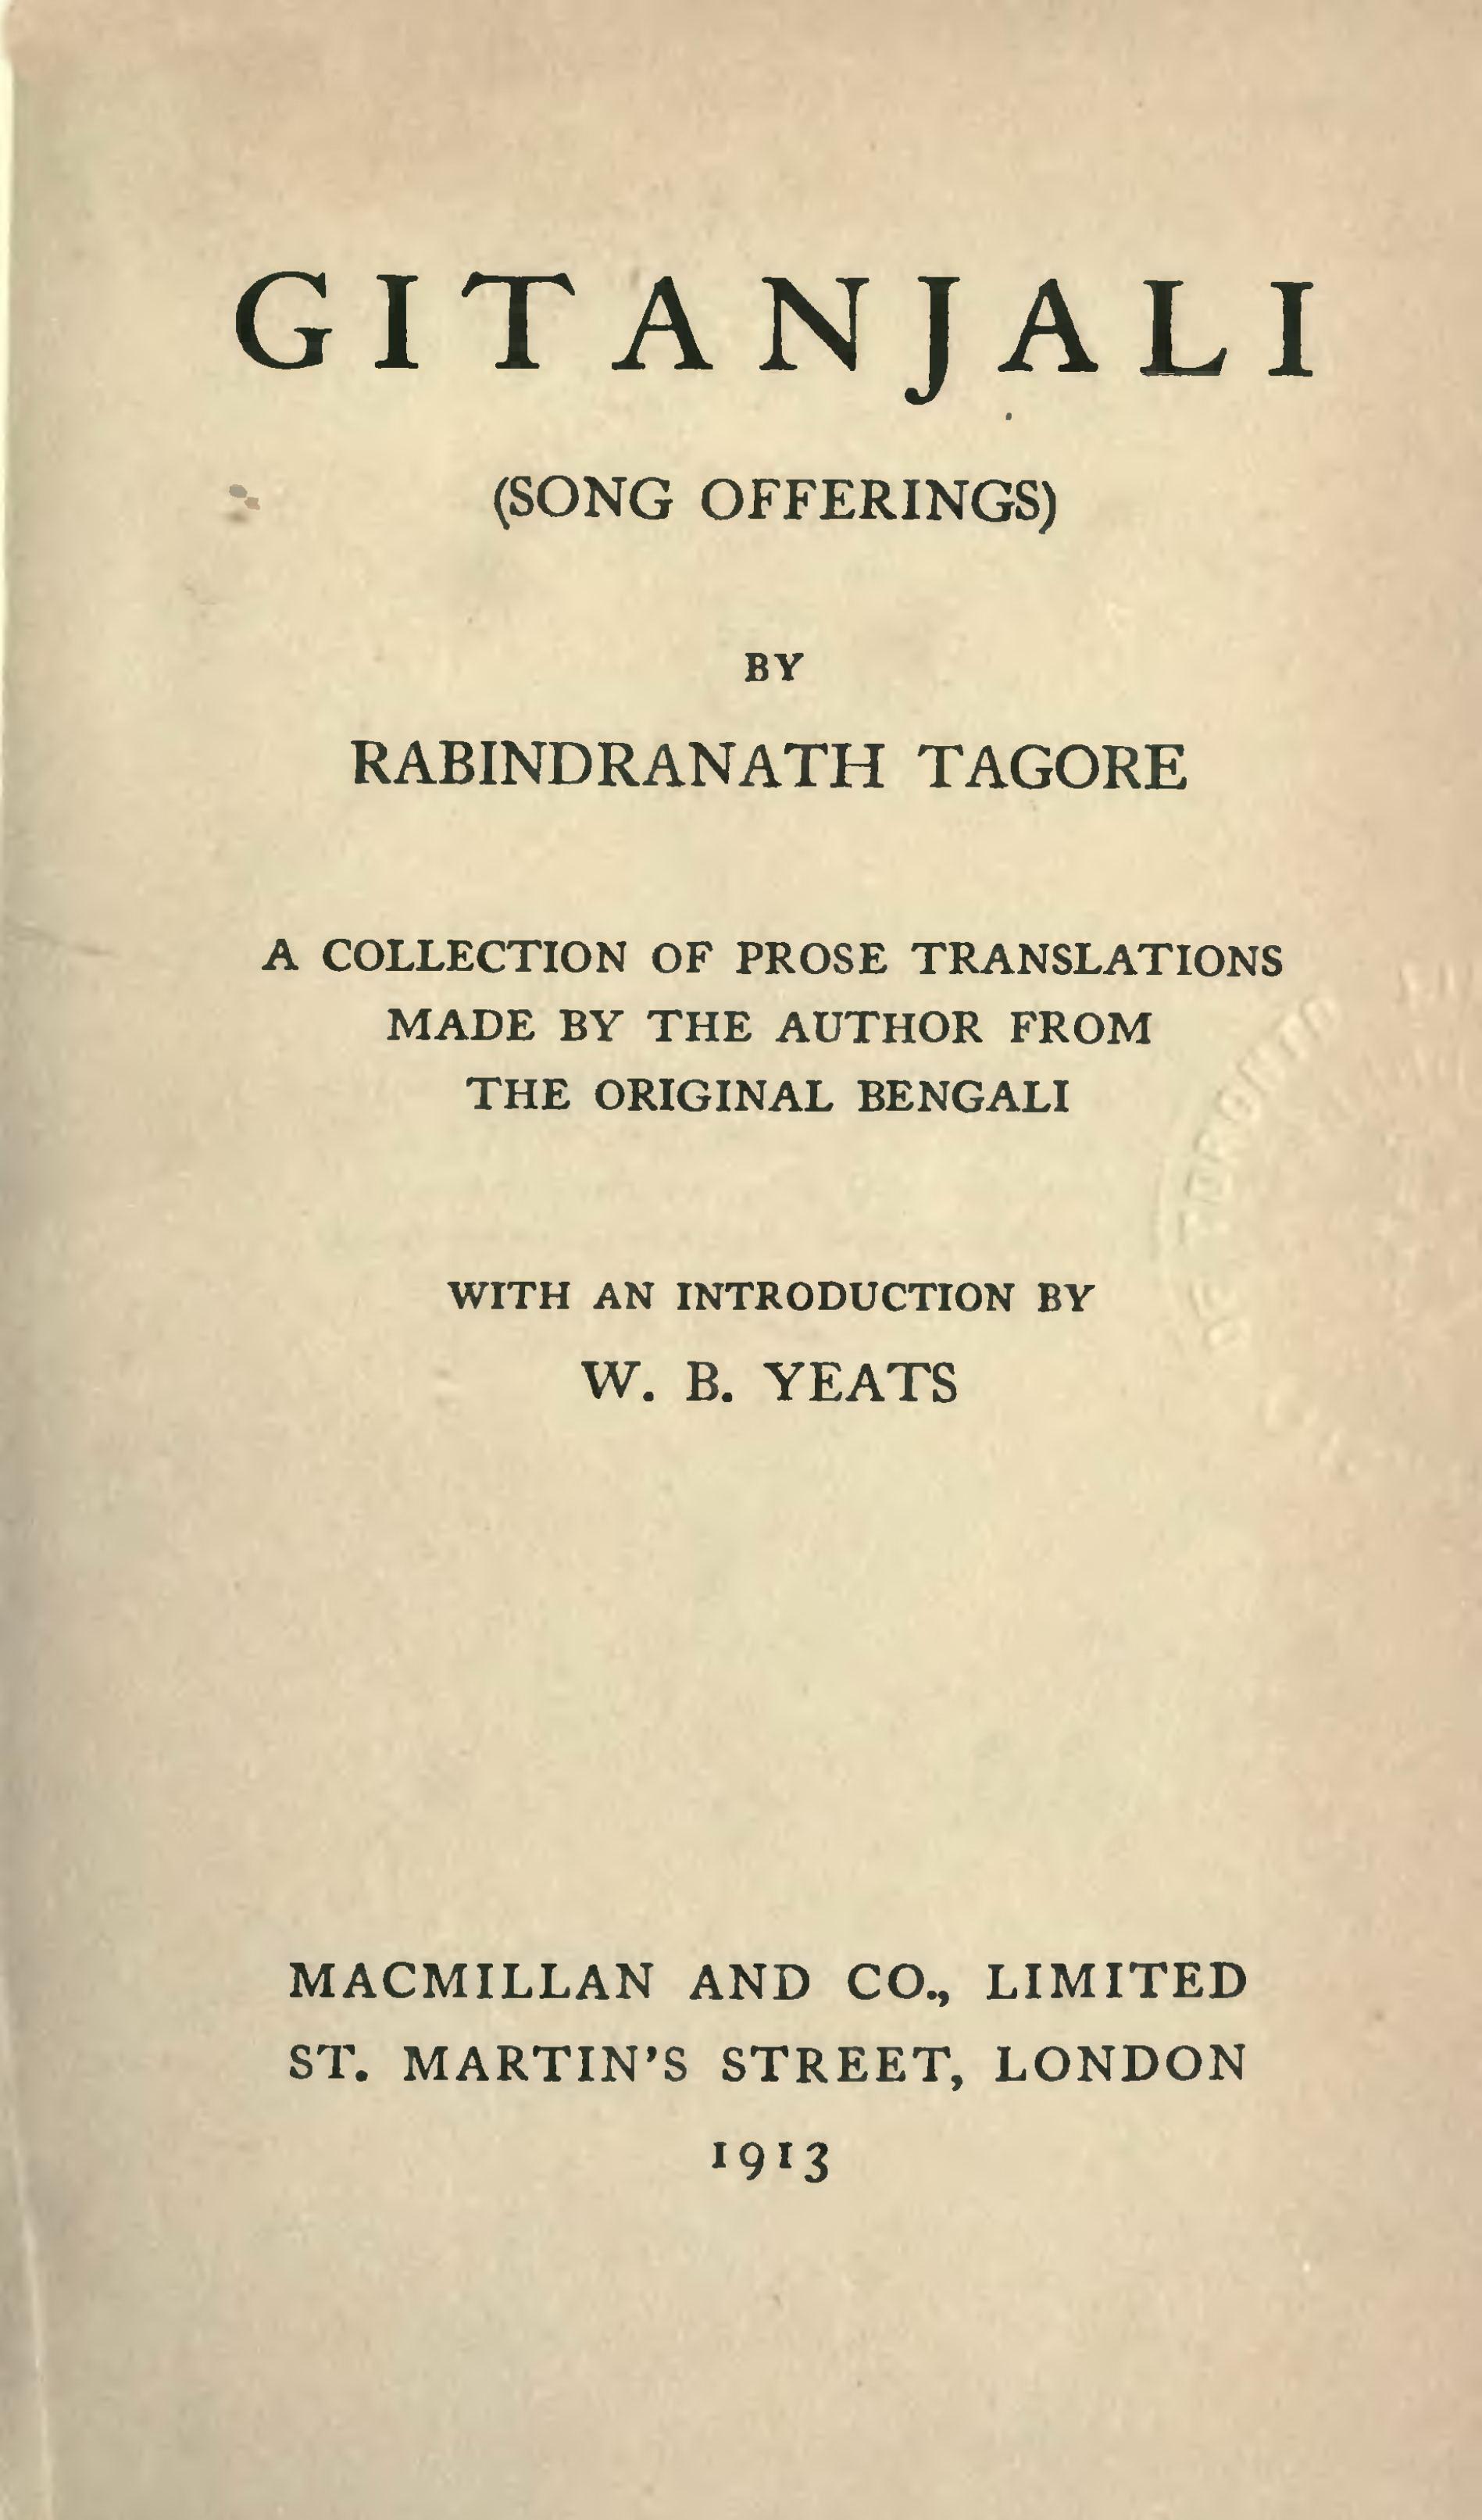 File:Gitanjali title page Rabindranath Tagore.jpg